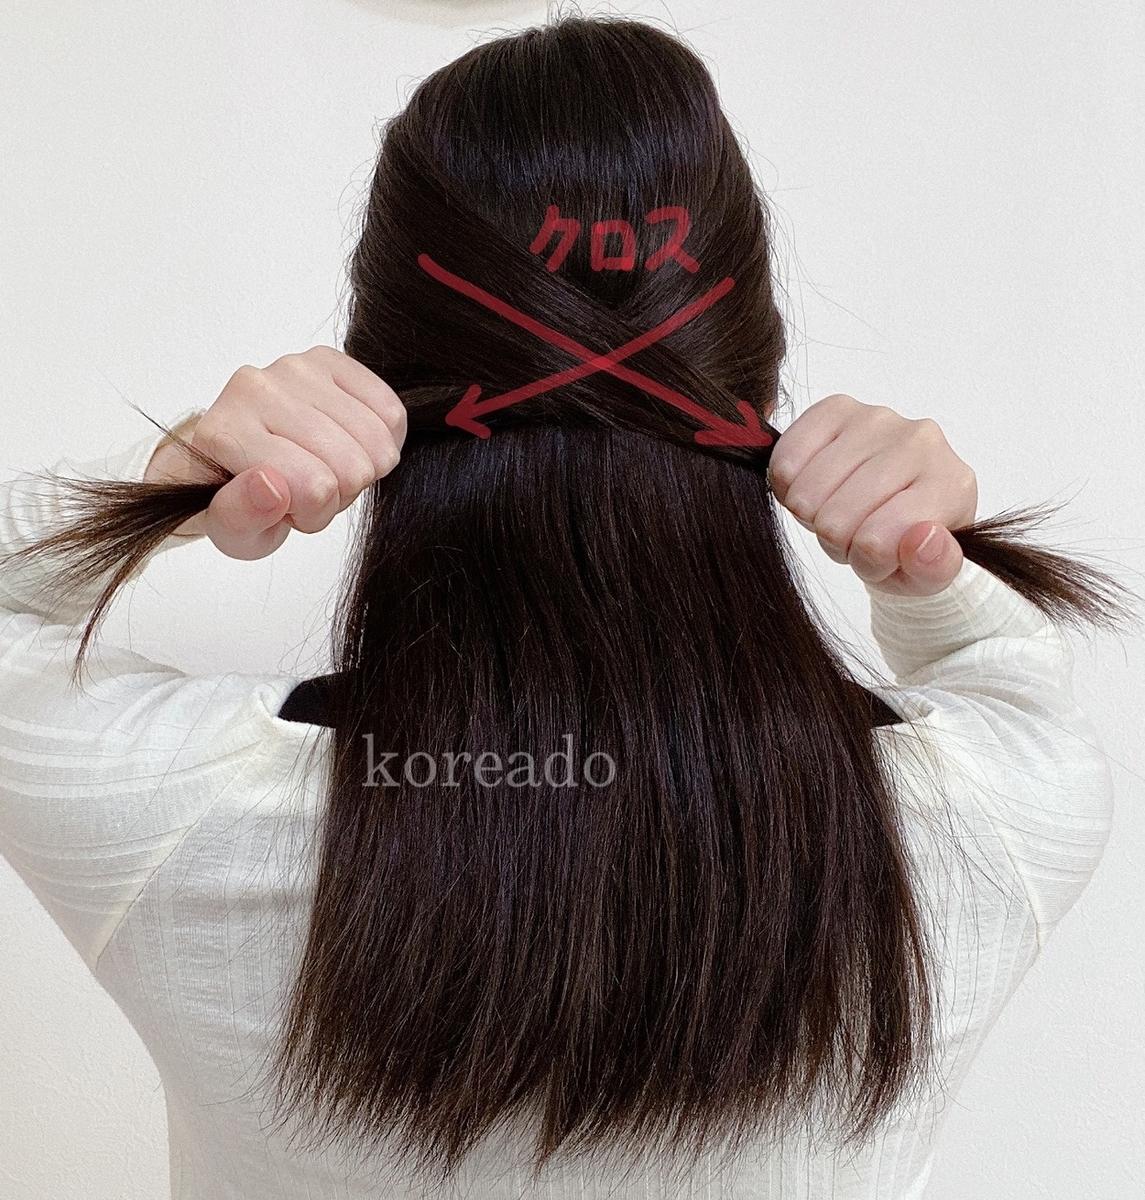 f:id:i-love-korea:20210424172943j:plain